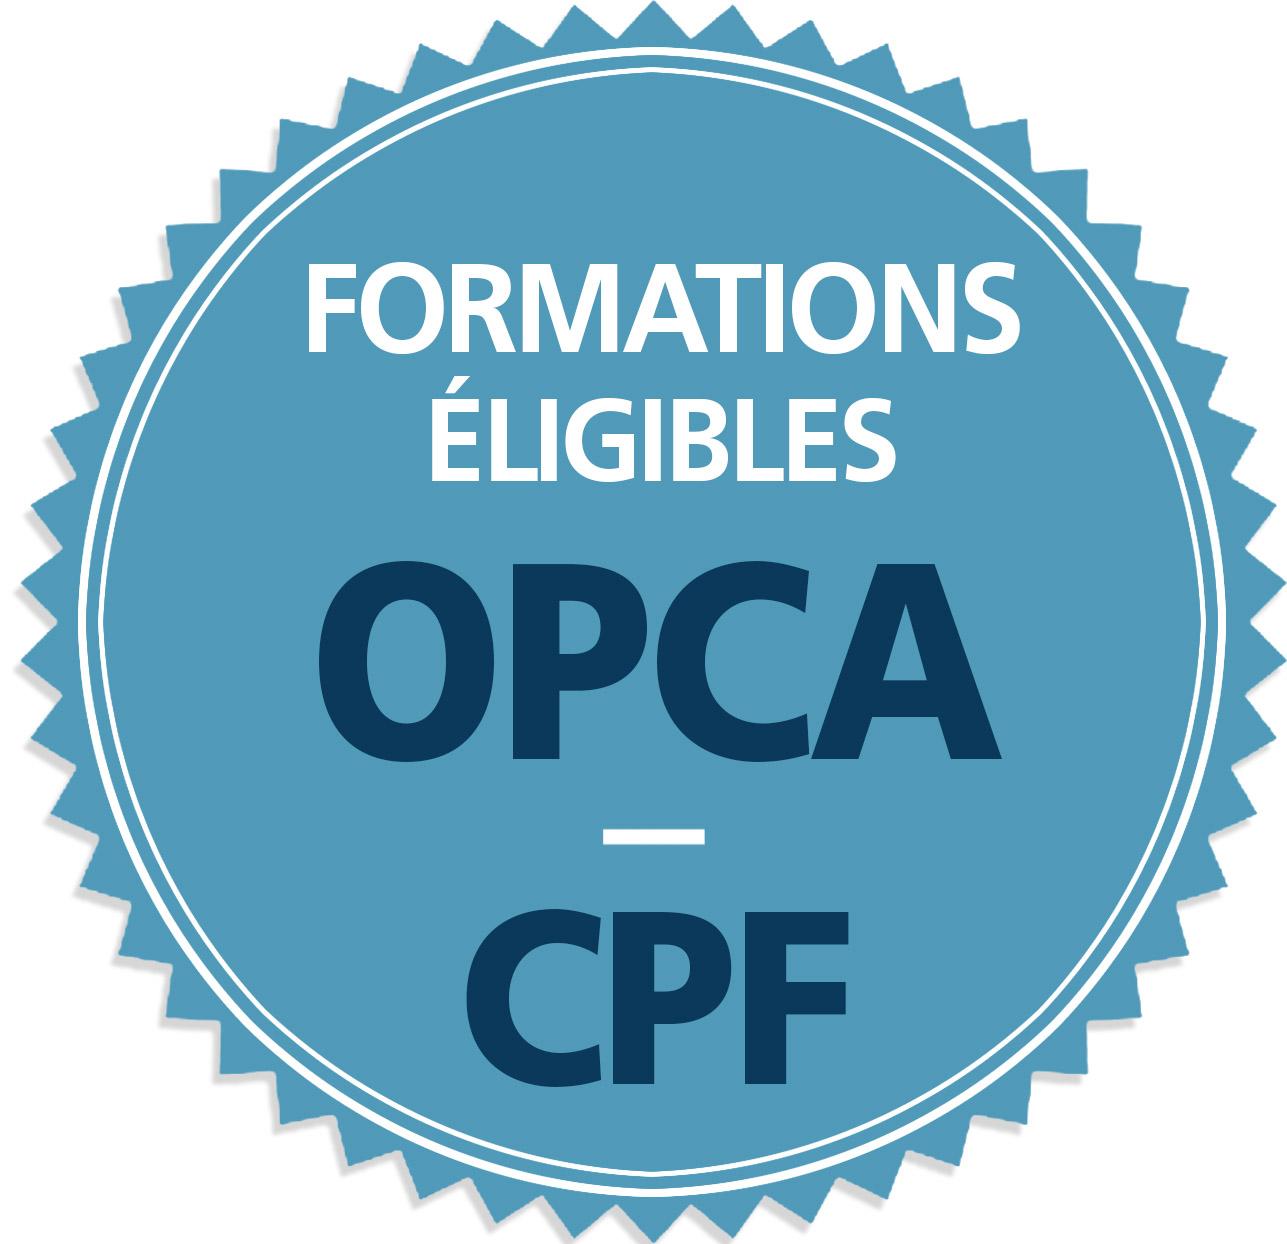 Toutes nos formations sont éligibles OPCA - CPF ou DIF